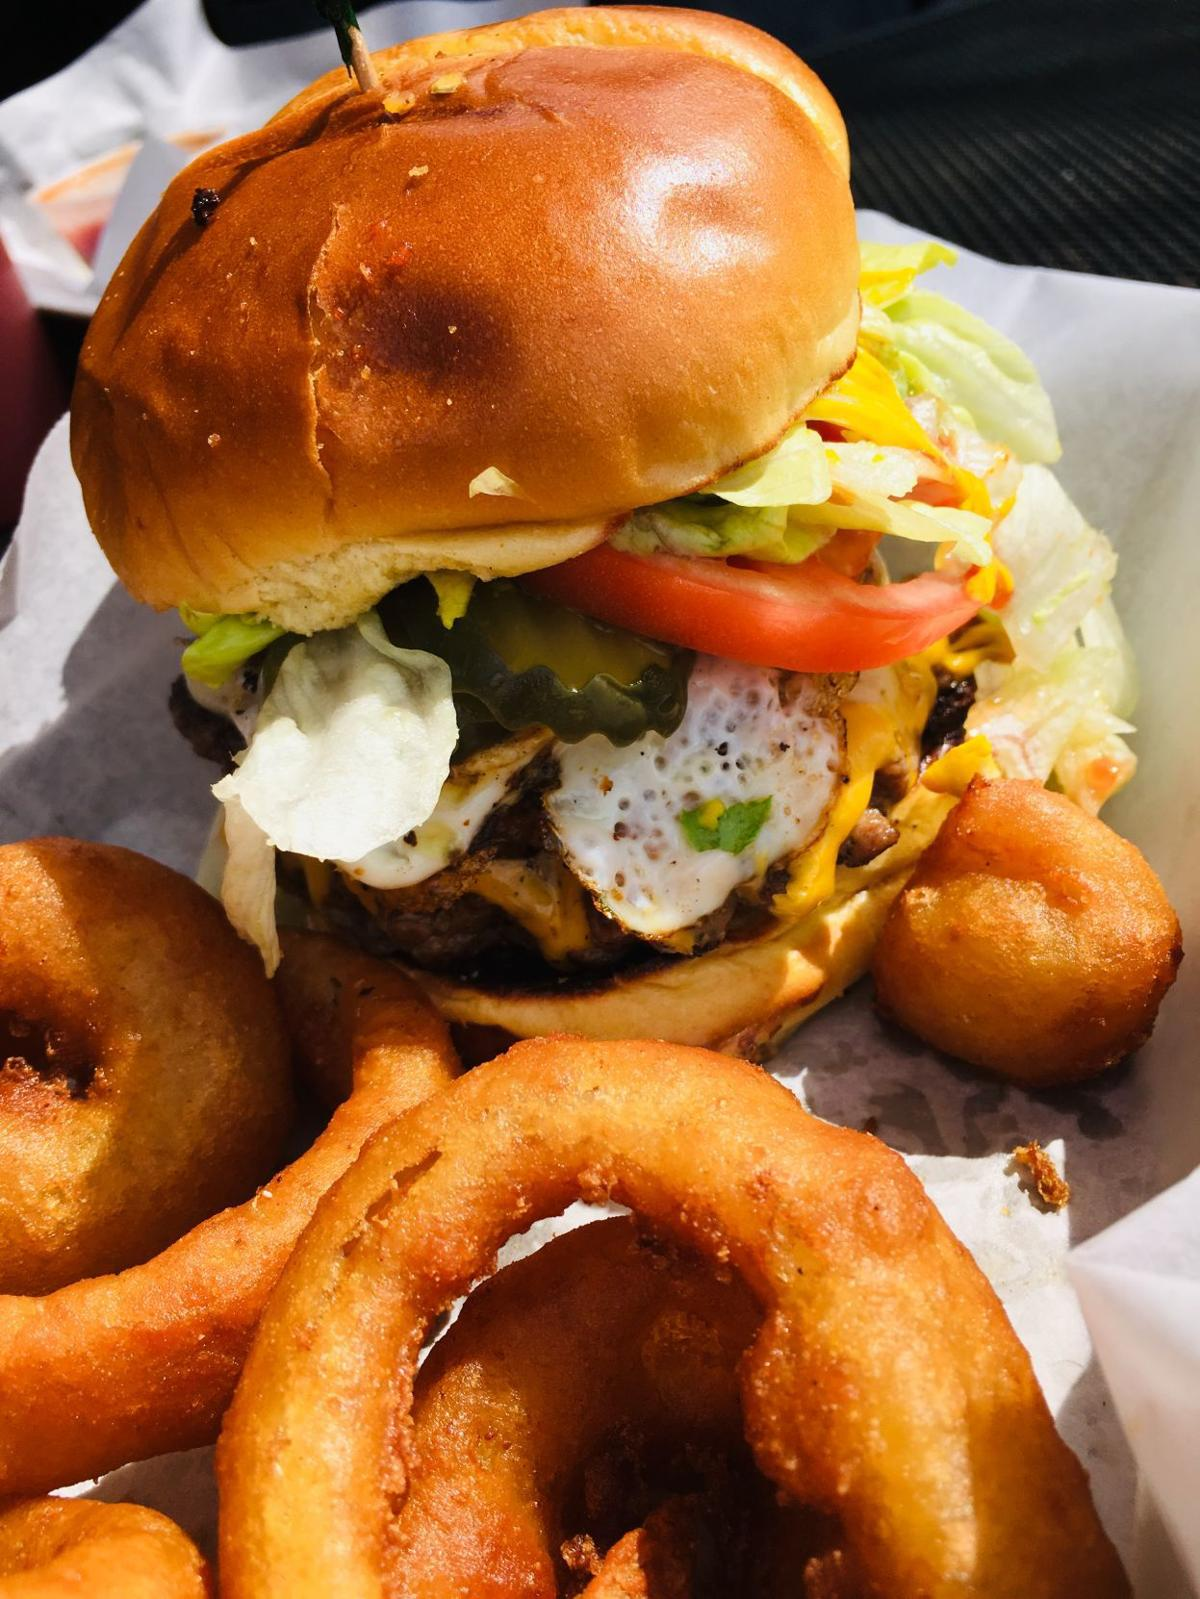 20190403-gm-food-guy-burger-2-IMG_2148.jpg